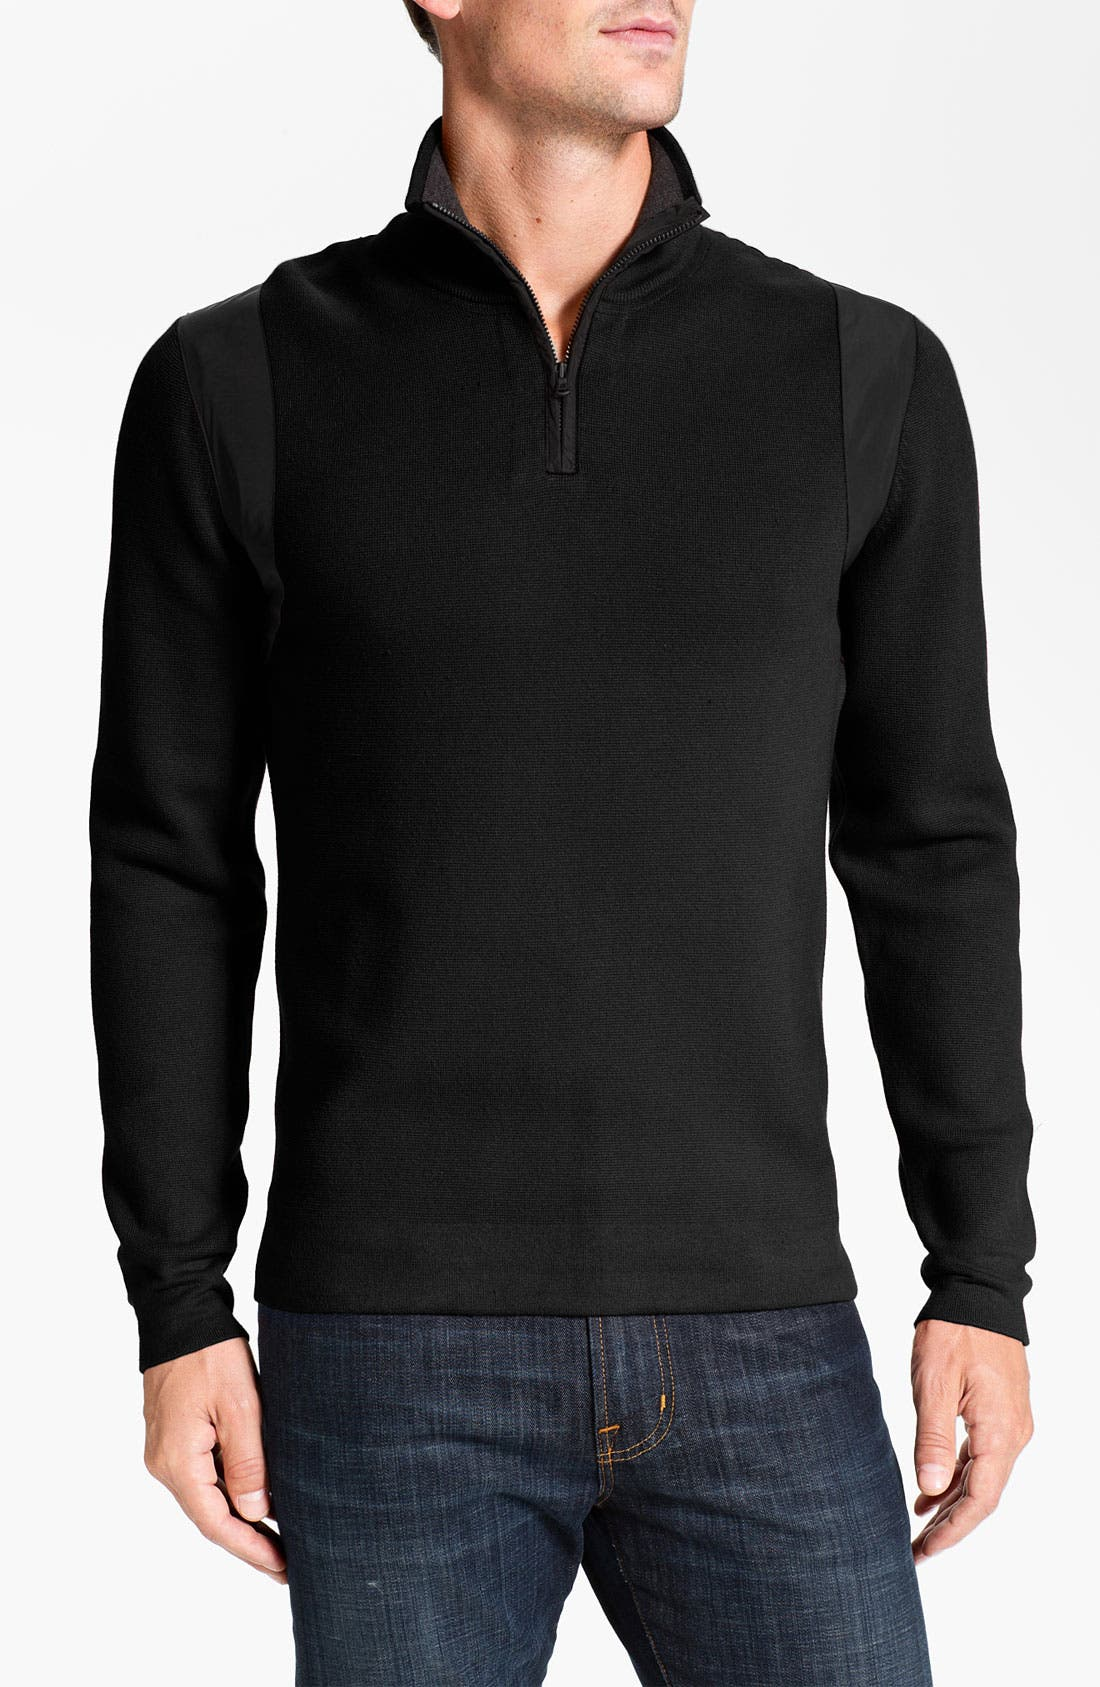 Main Image - Victorinox Swiss Army® 'Traveler' Quarter Zip Sweater (Online Exclusive)